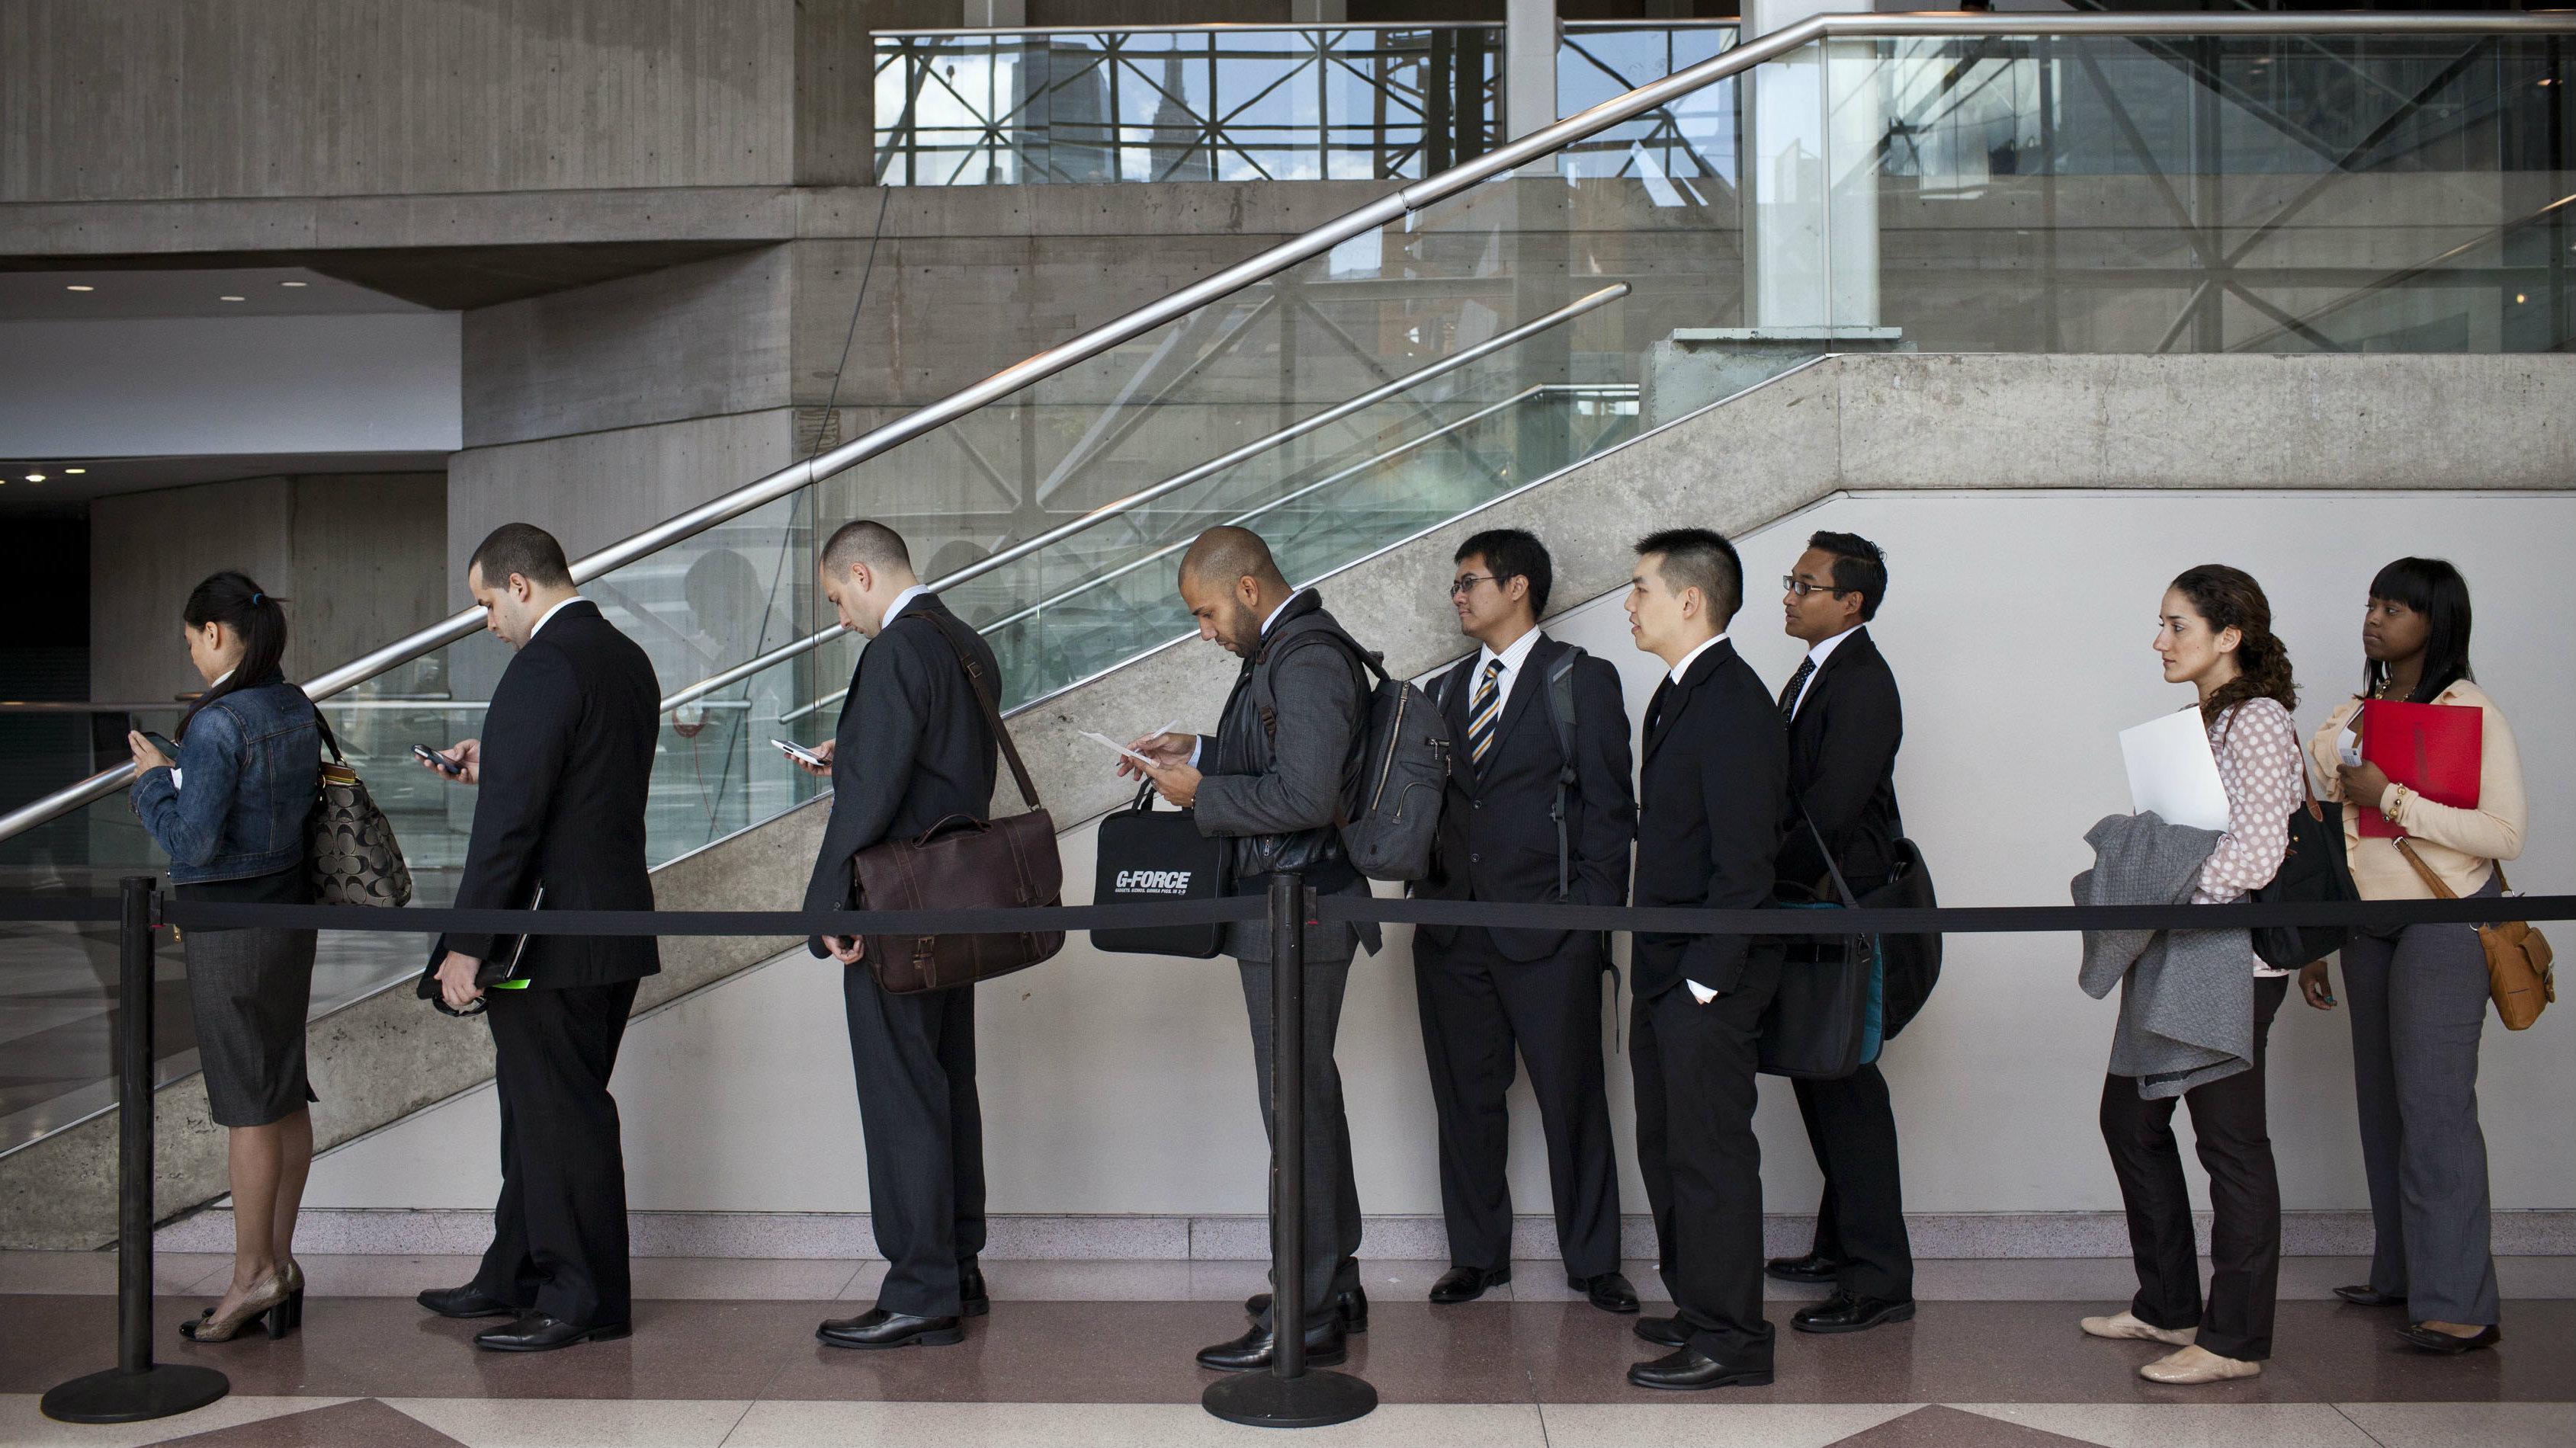 Young job hopefuls wait in line at job fair.